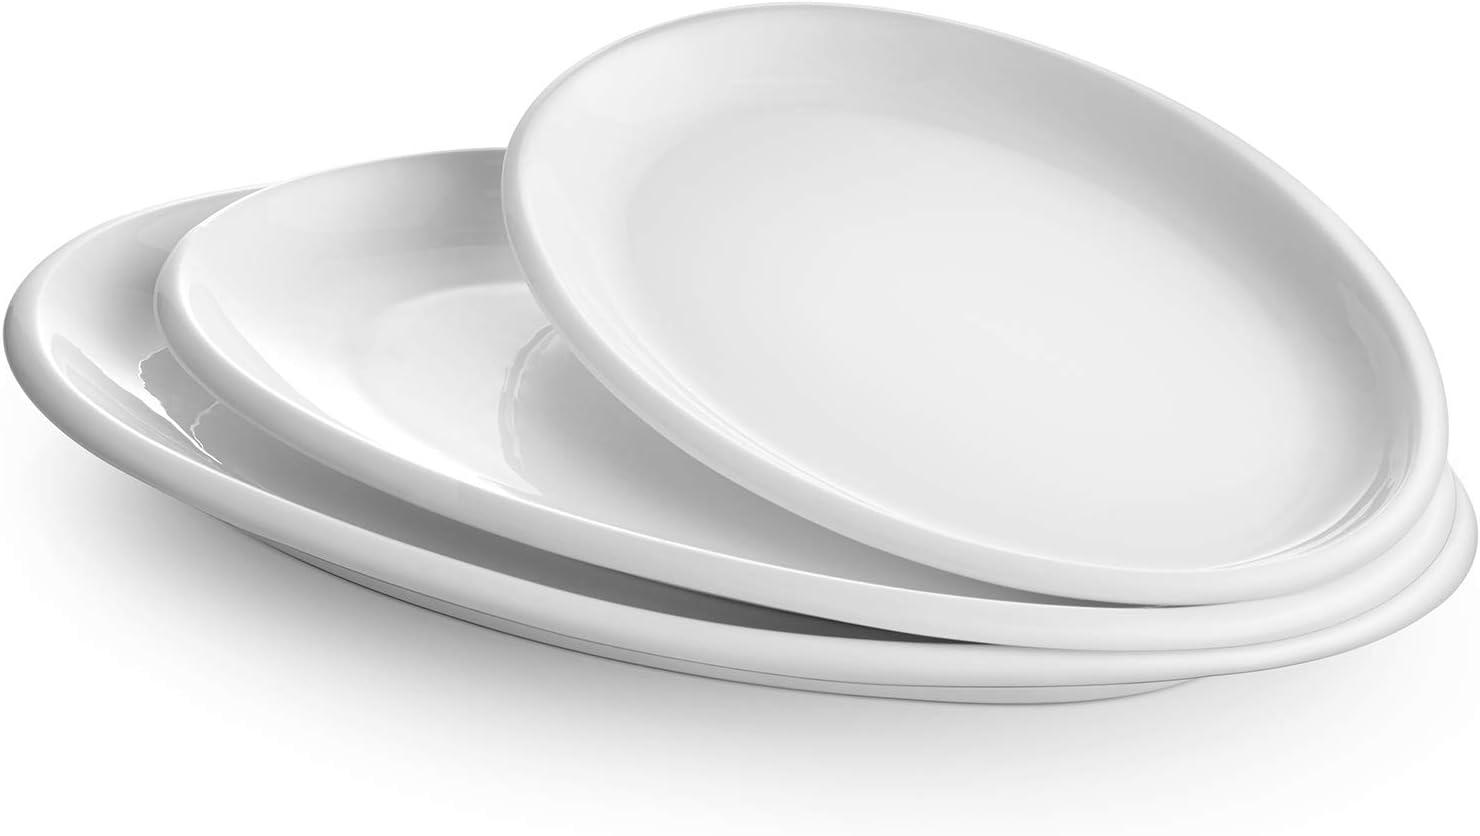 National uniform free shipping DOWAN Large Serving Platters 12